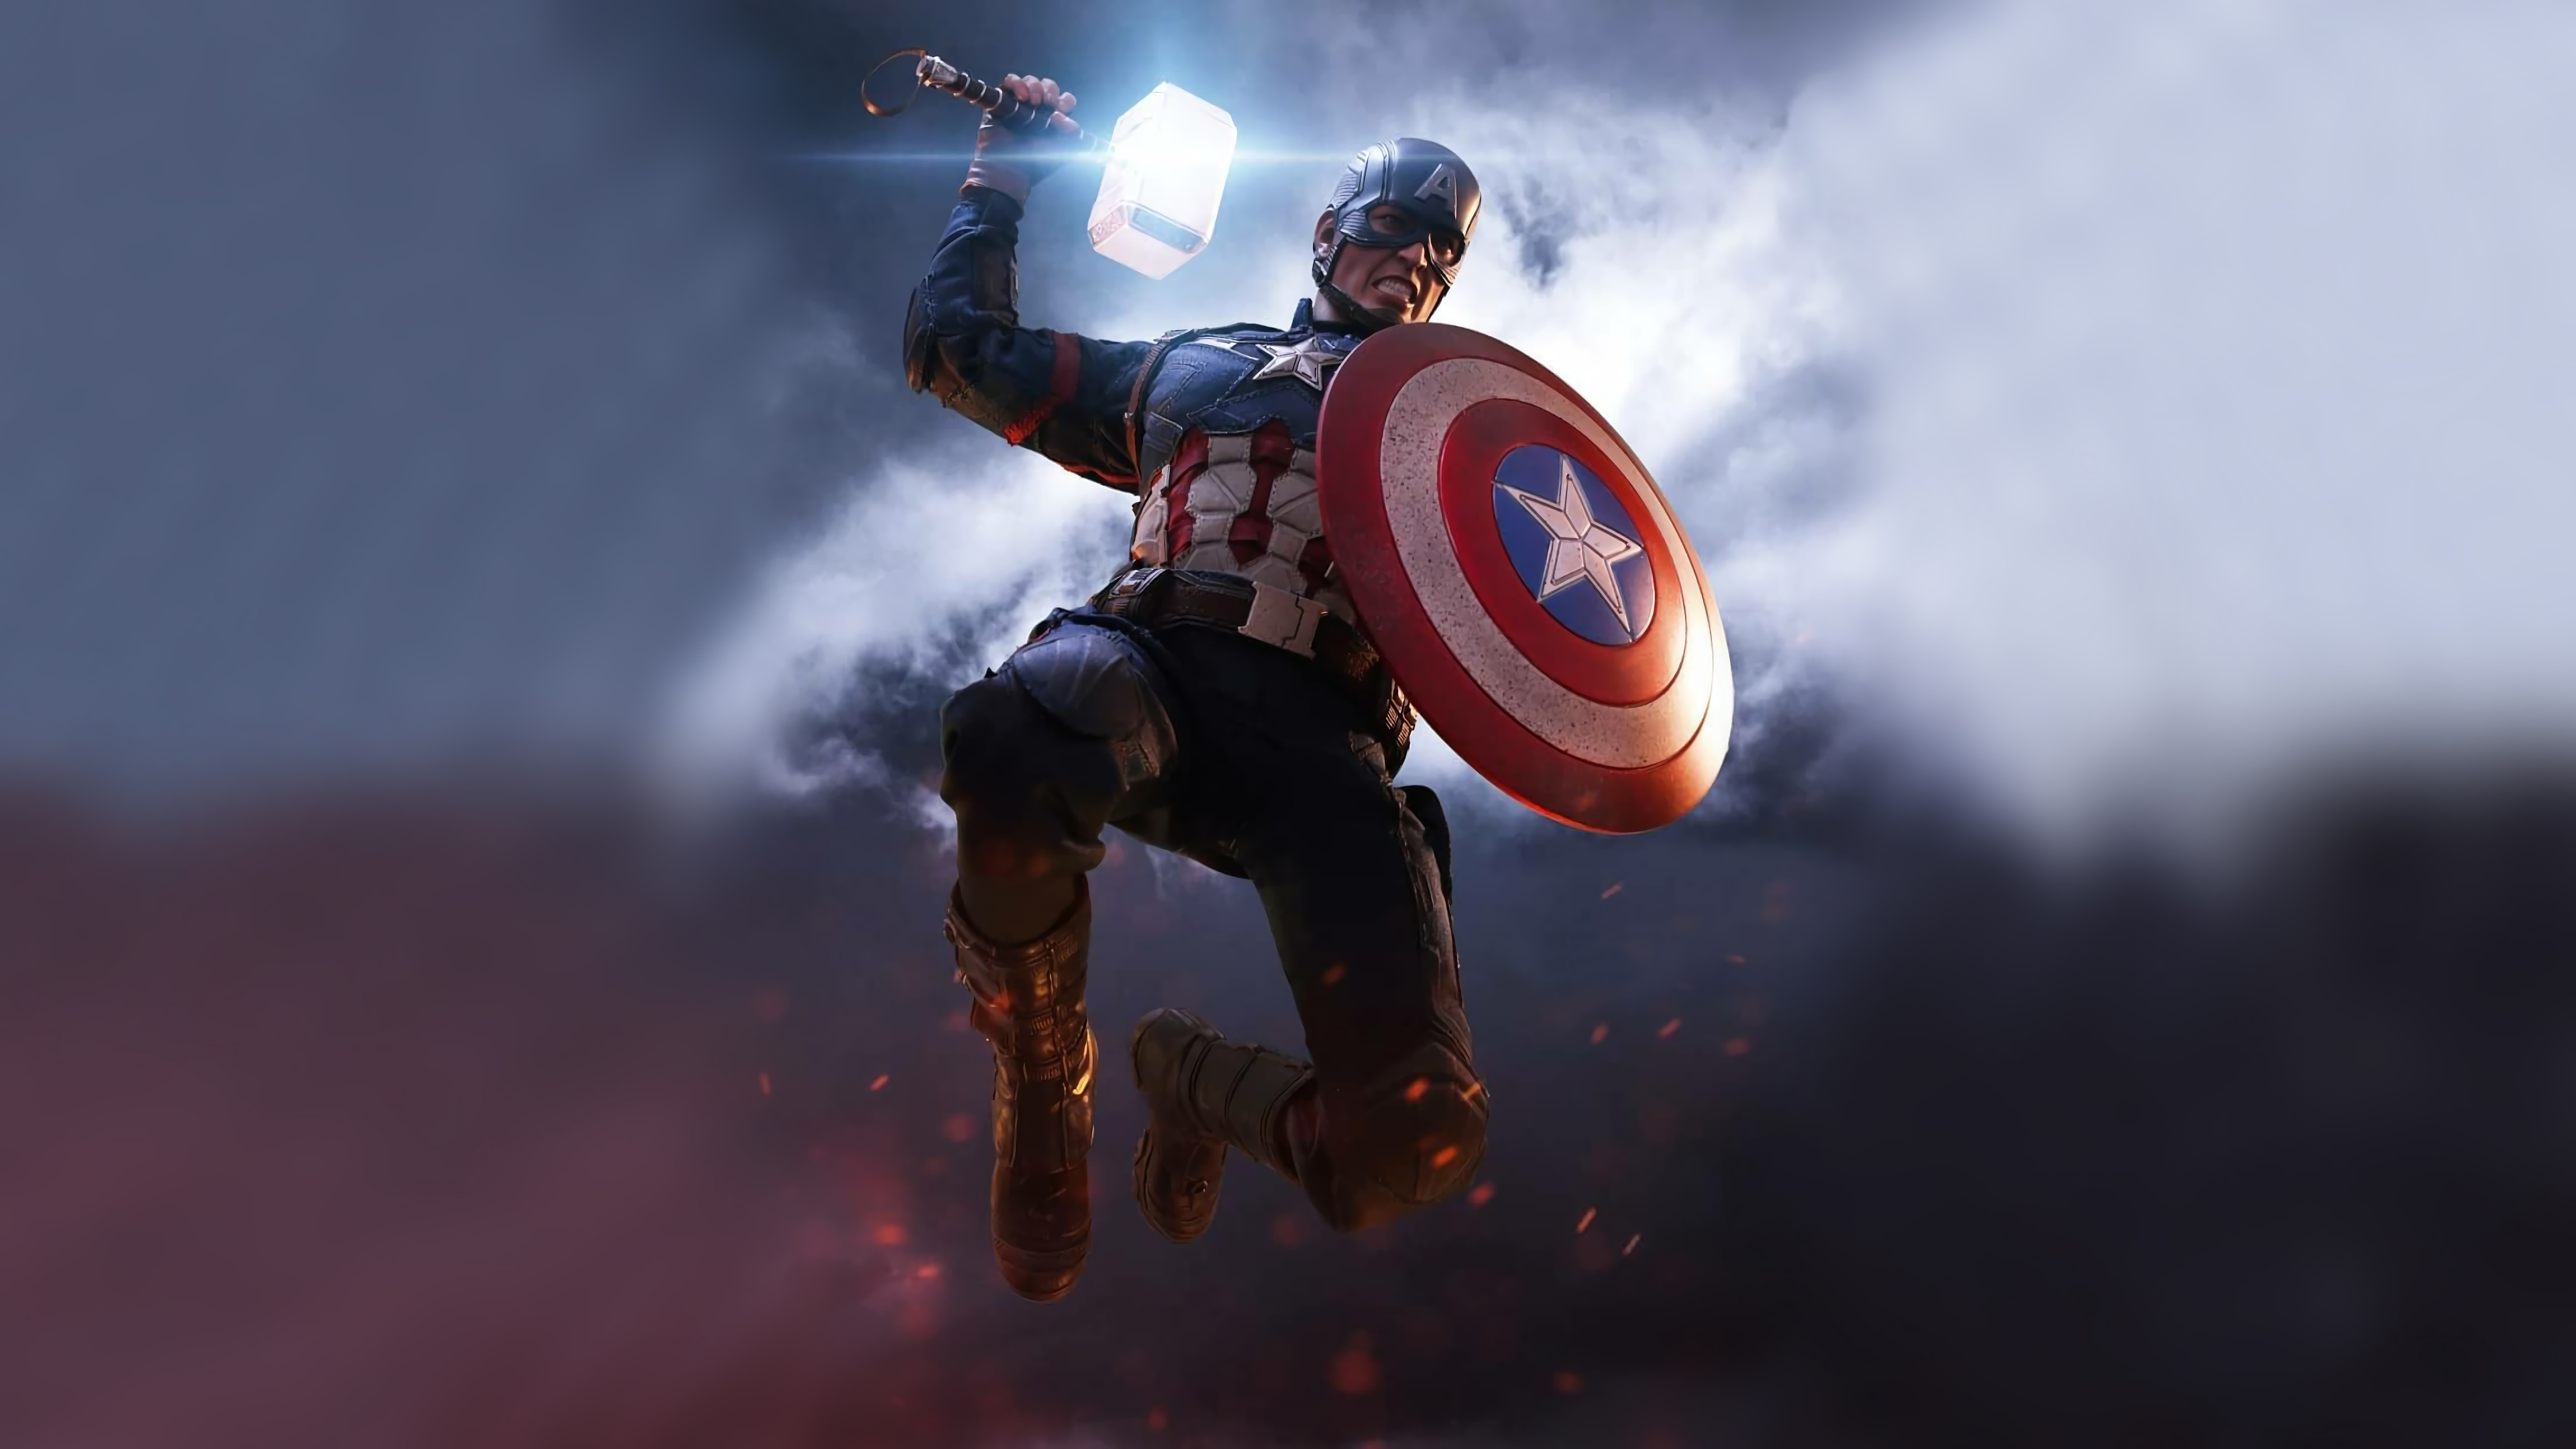 Captain America Mjolnir Artwork 4k, HD Superheroes, 4k ...